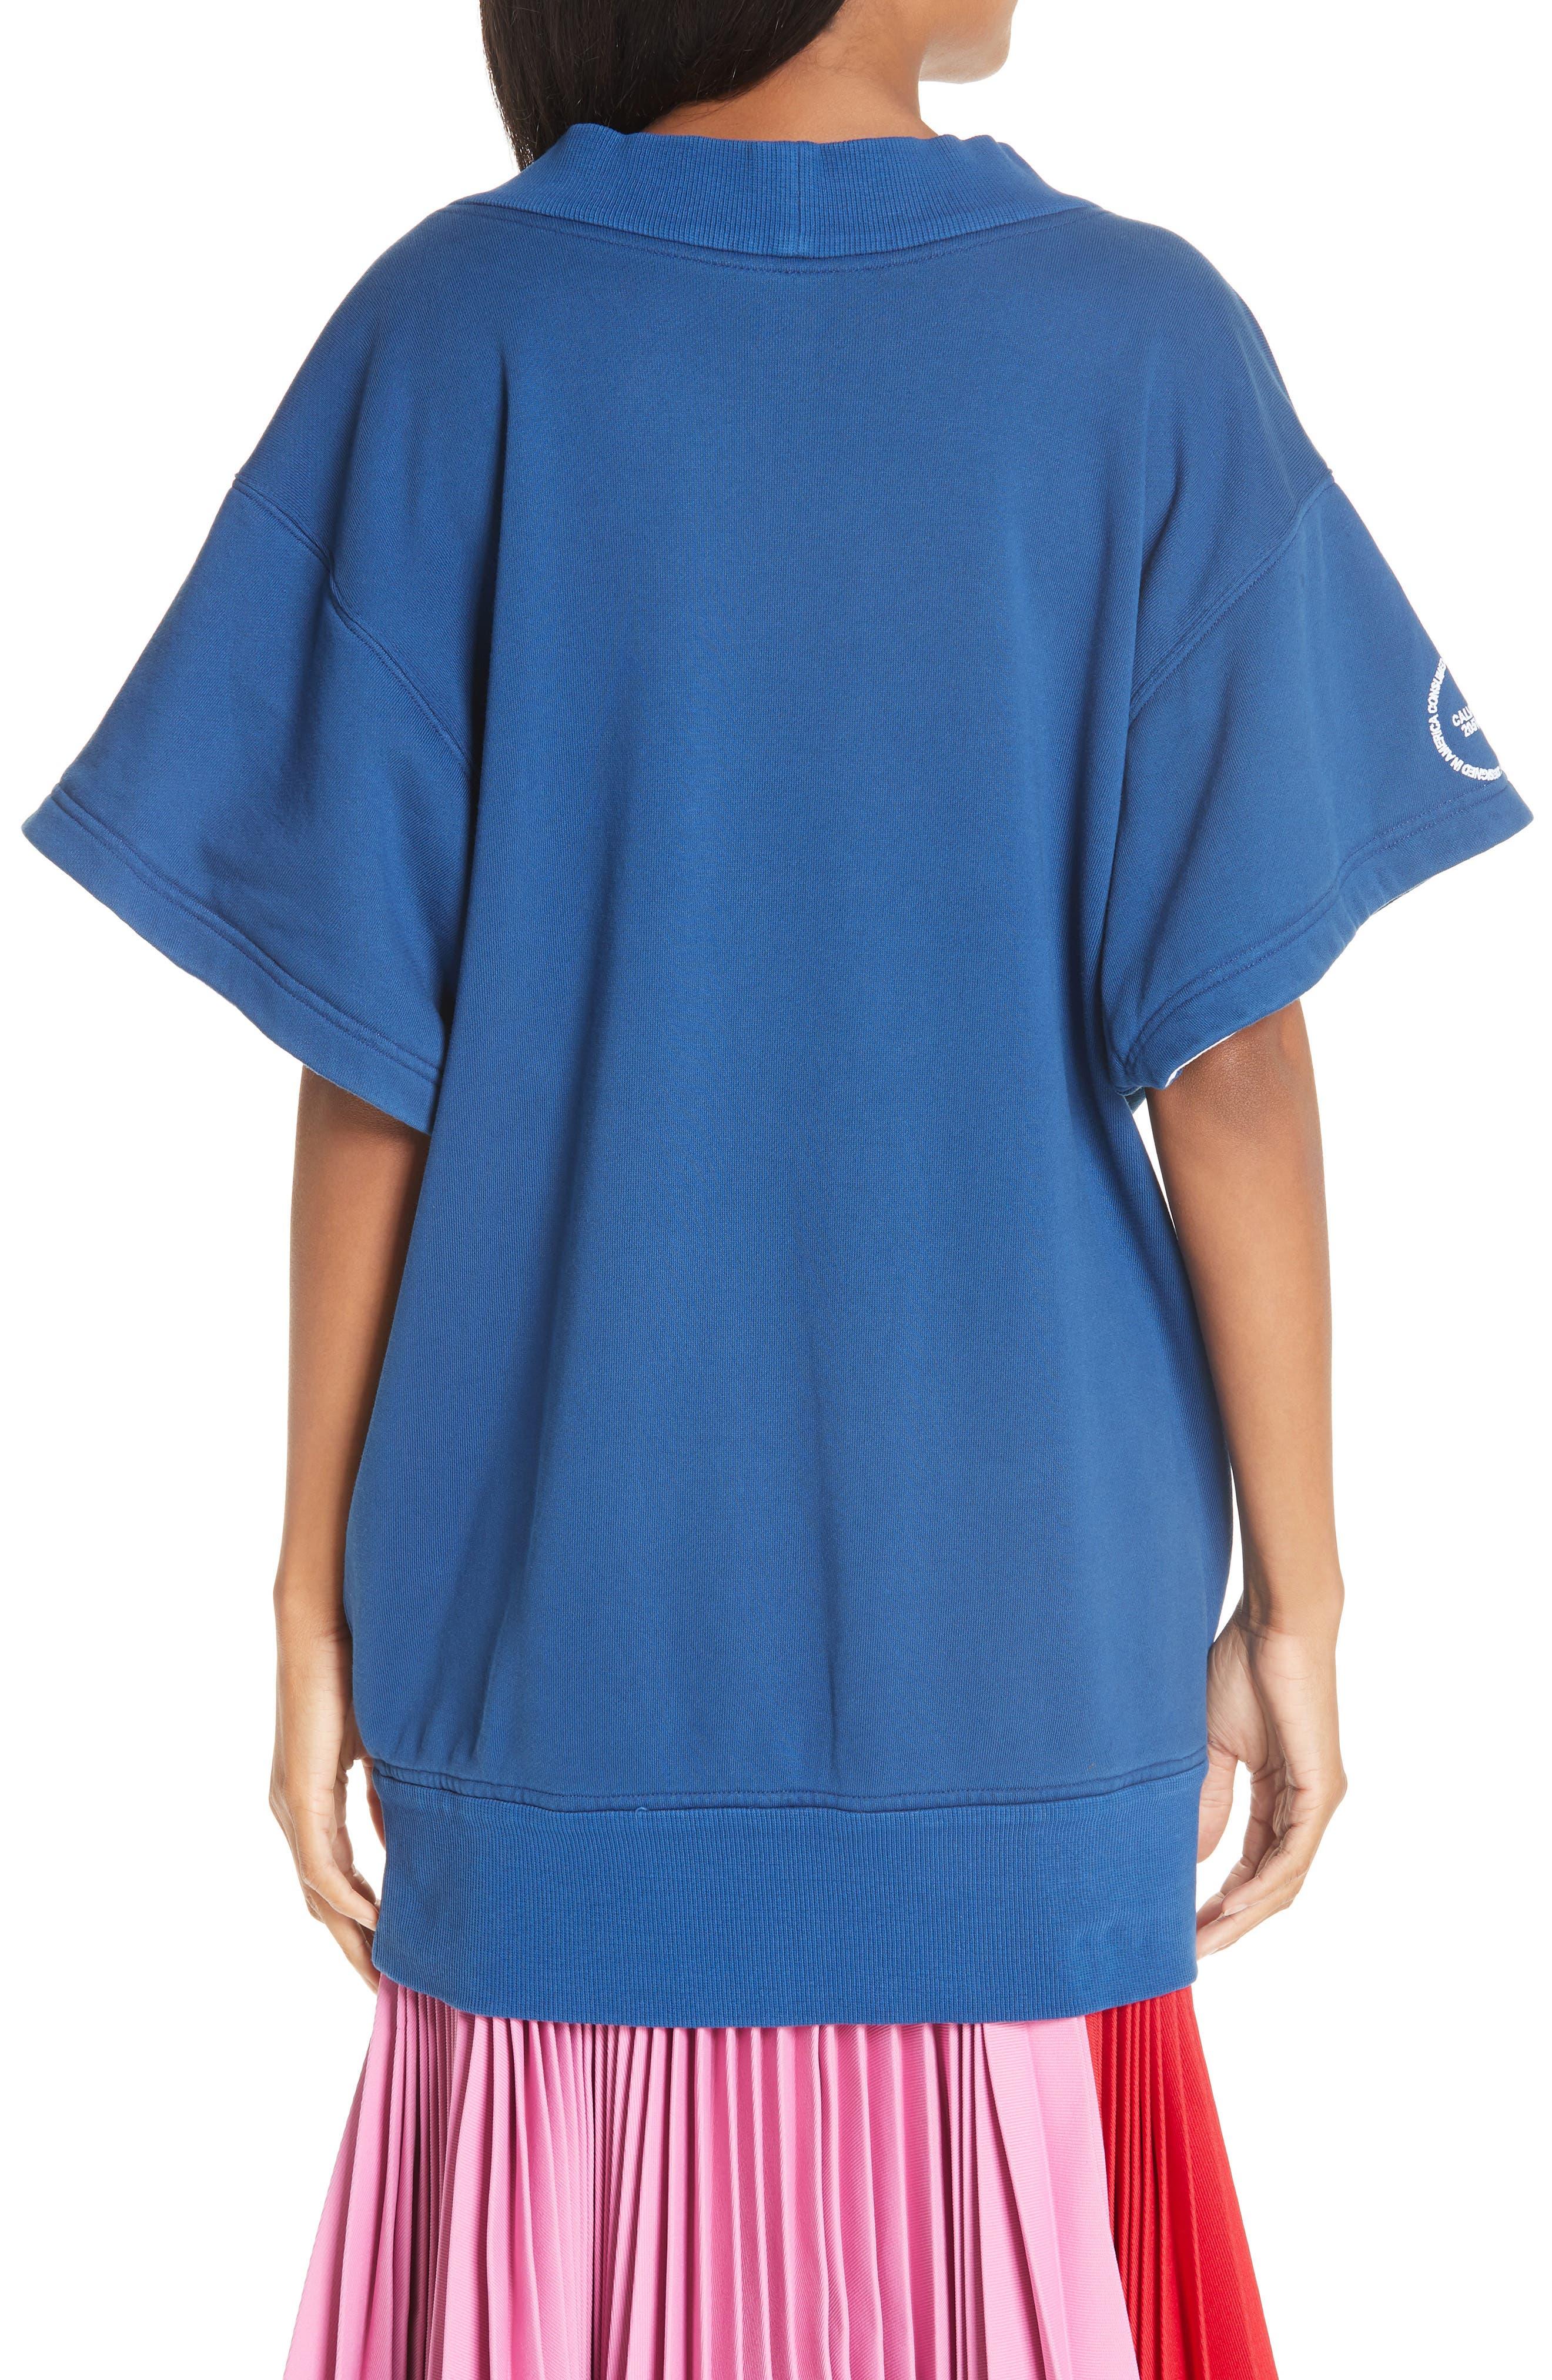 CALVIN KLEIN 205W39NYC, Yale Short Sleeve Sweatshirt, Alternate thumbnail 2, color, YALE BLUE